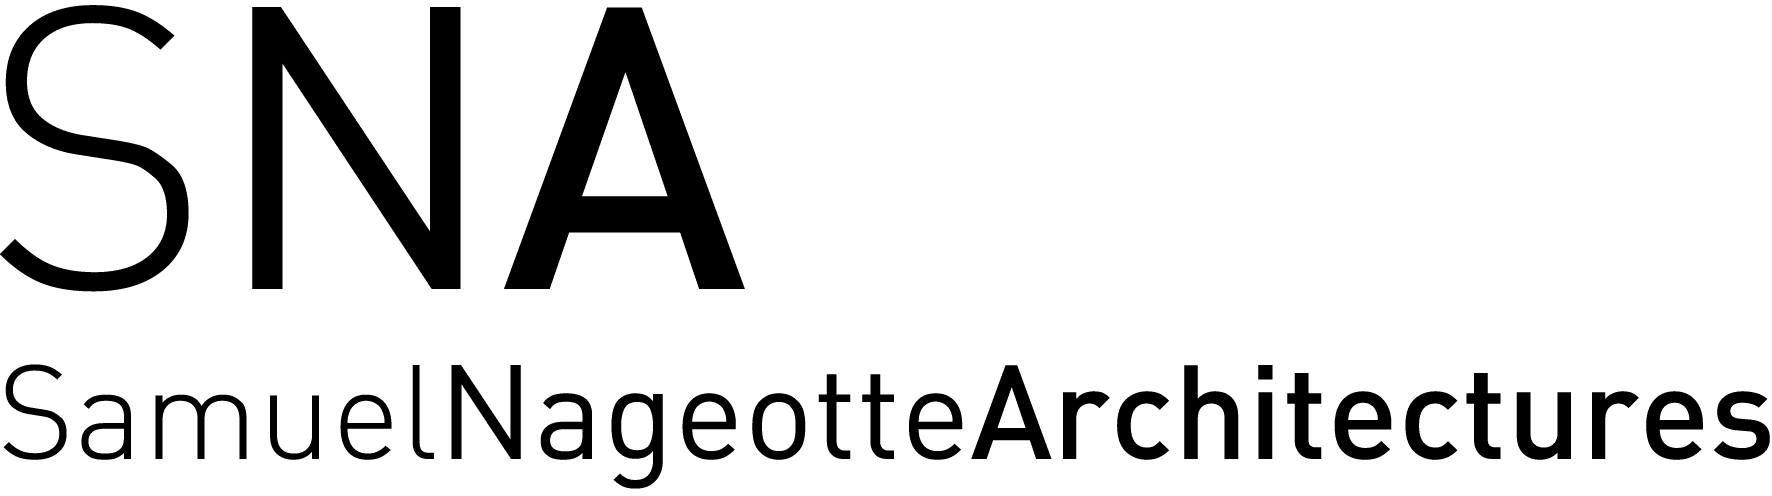 Samuel Nageotte Architectures